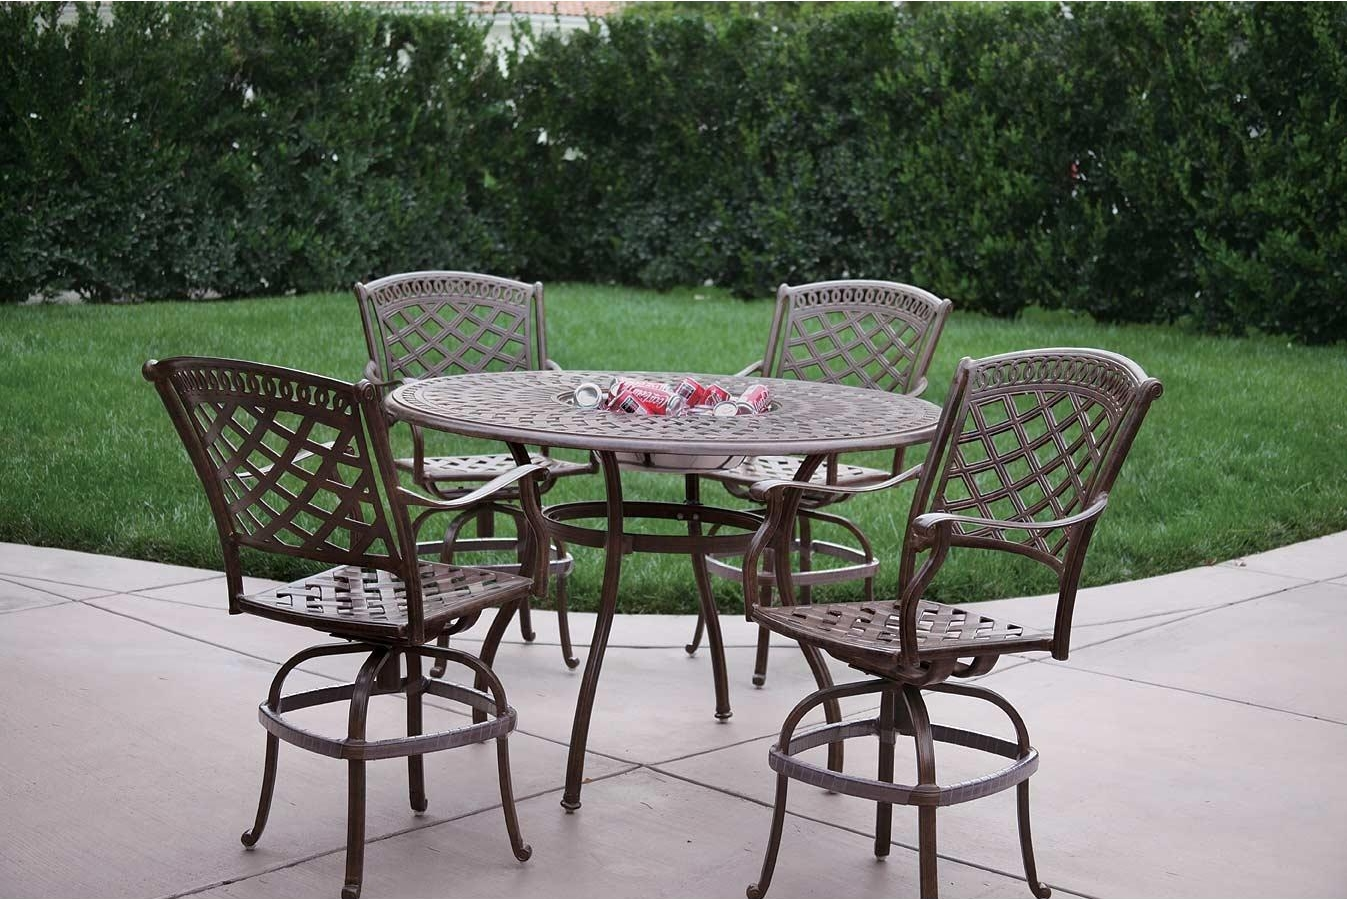 Picture of: Patio Furniture Dining Set Cast Aluminum 52 Round Table W Ice Bucket Insert 5pc Pub Sedona